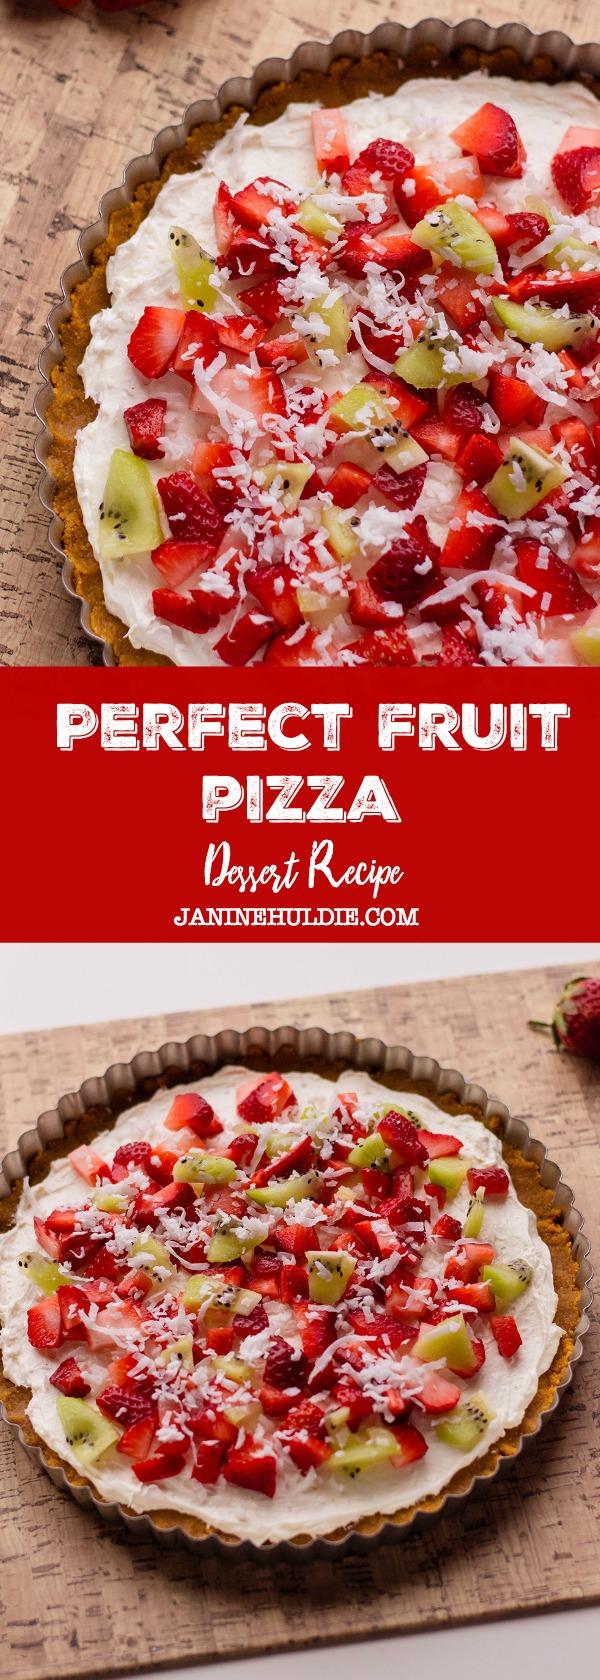 Perfect Dessert Fruit Pizza Recipe